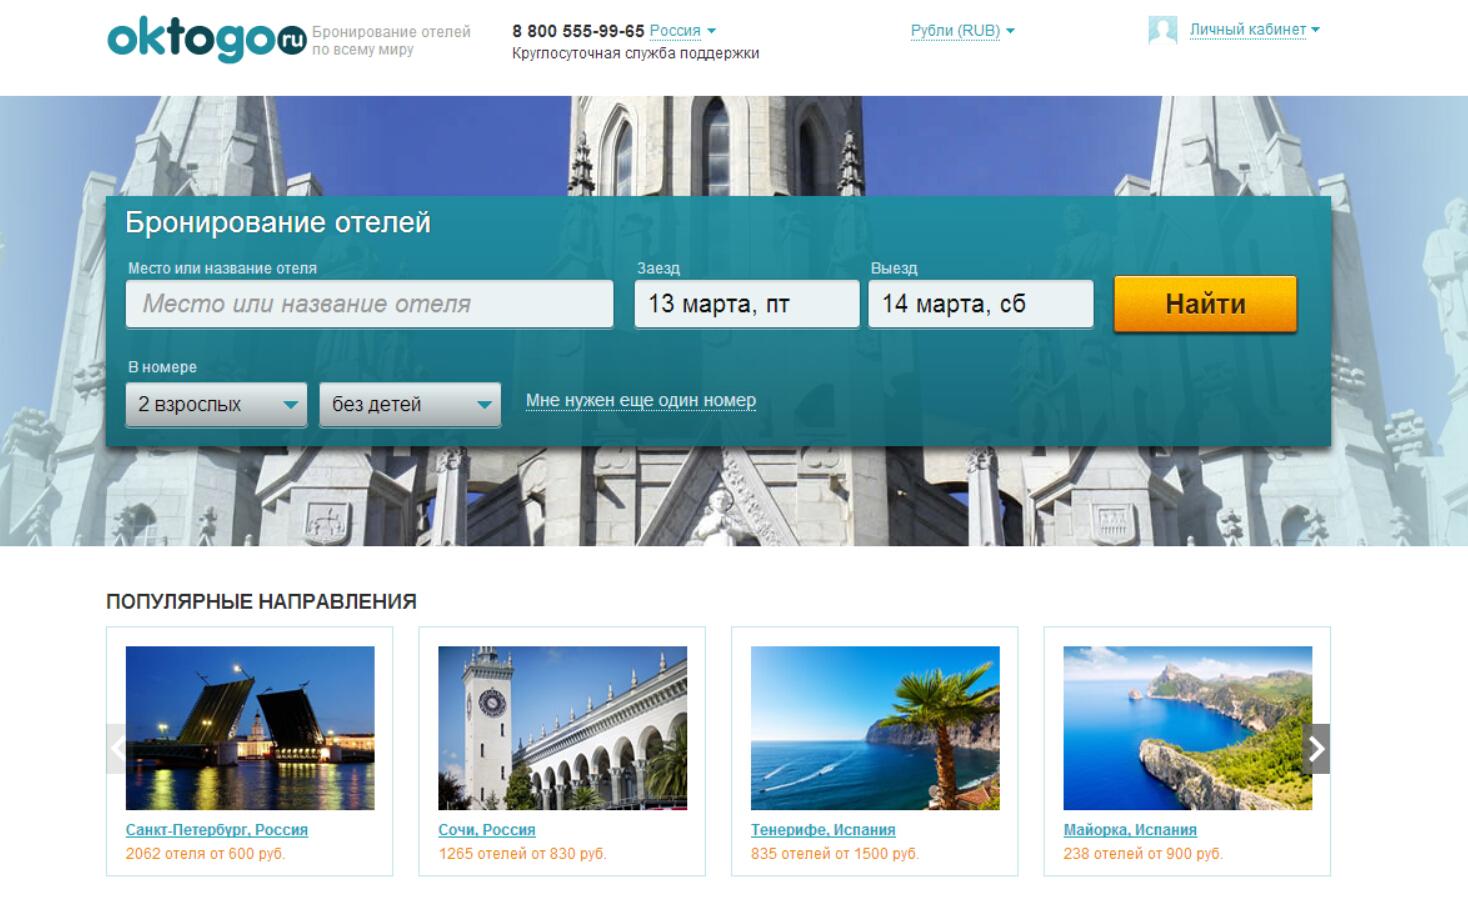 Oktogo:俄在线酒店服务公司融资500万美元